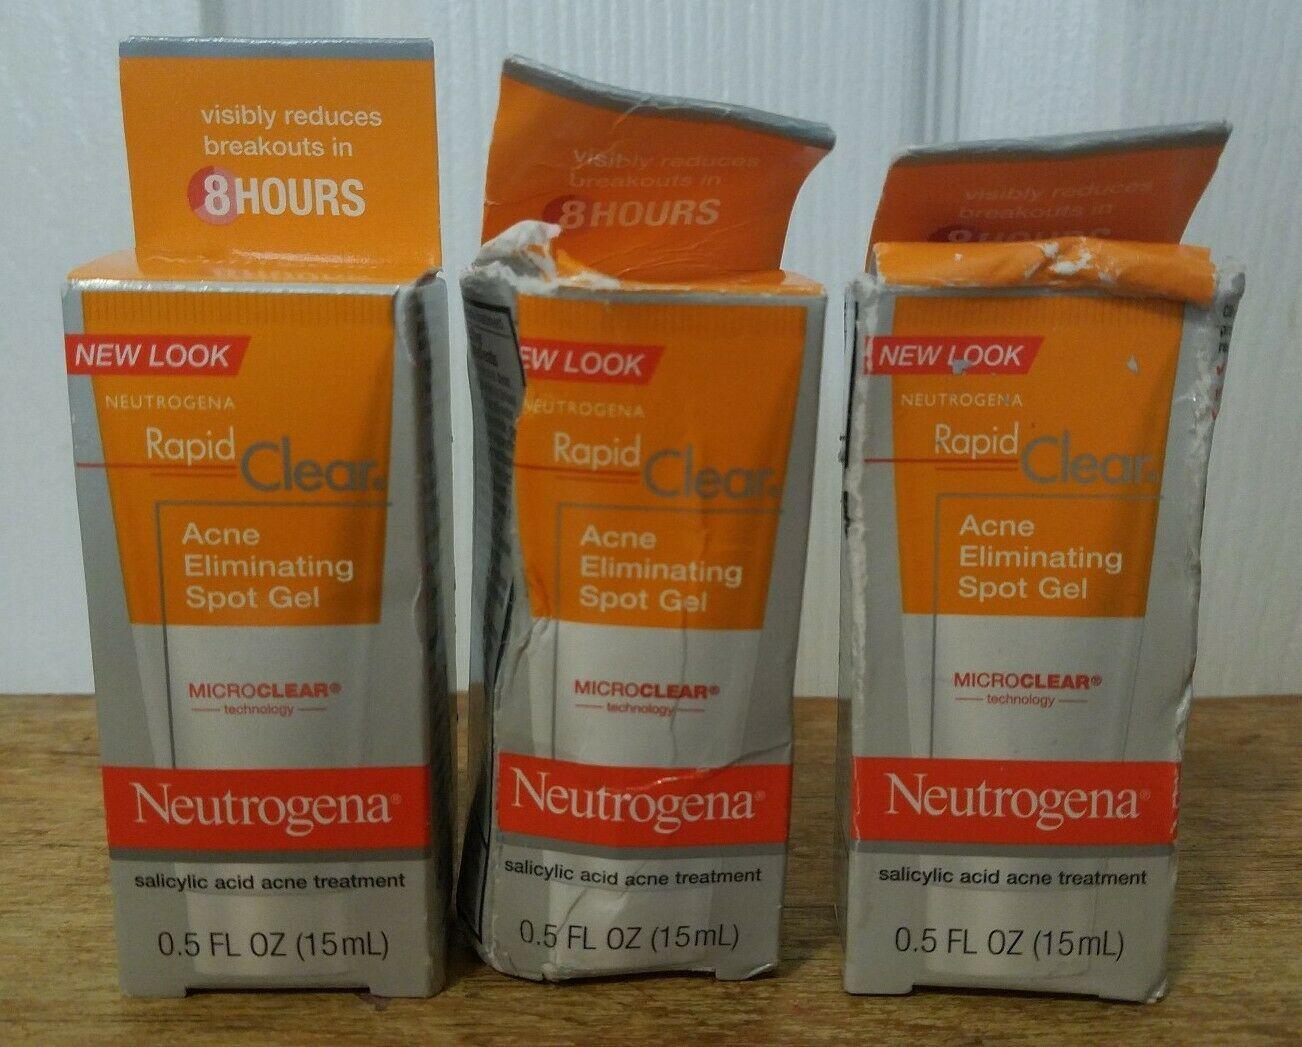 X3 Neutrogena Rapid Clear Acne Eliminating Spot Gel 0 5oz Exp